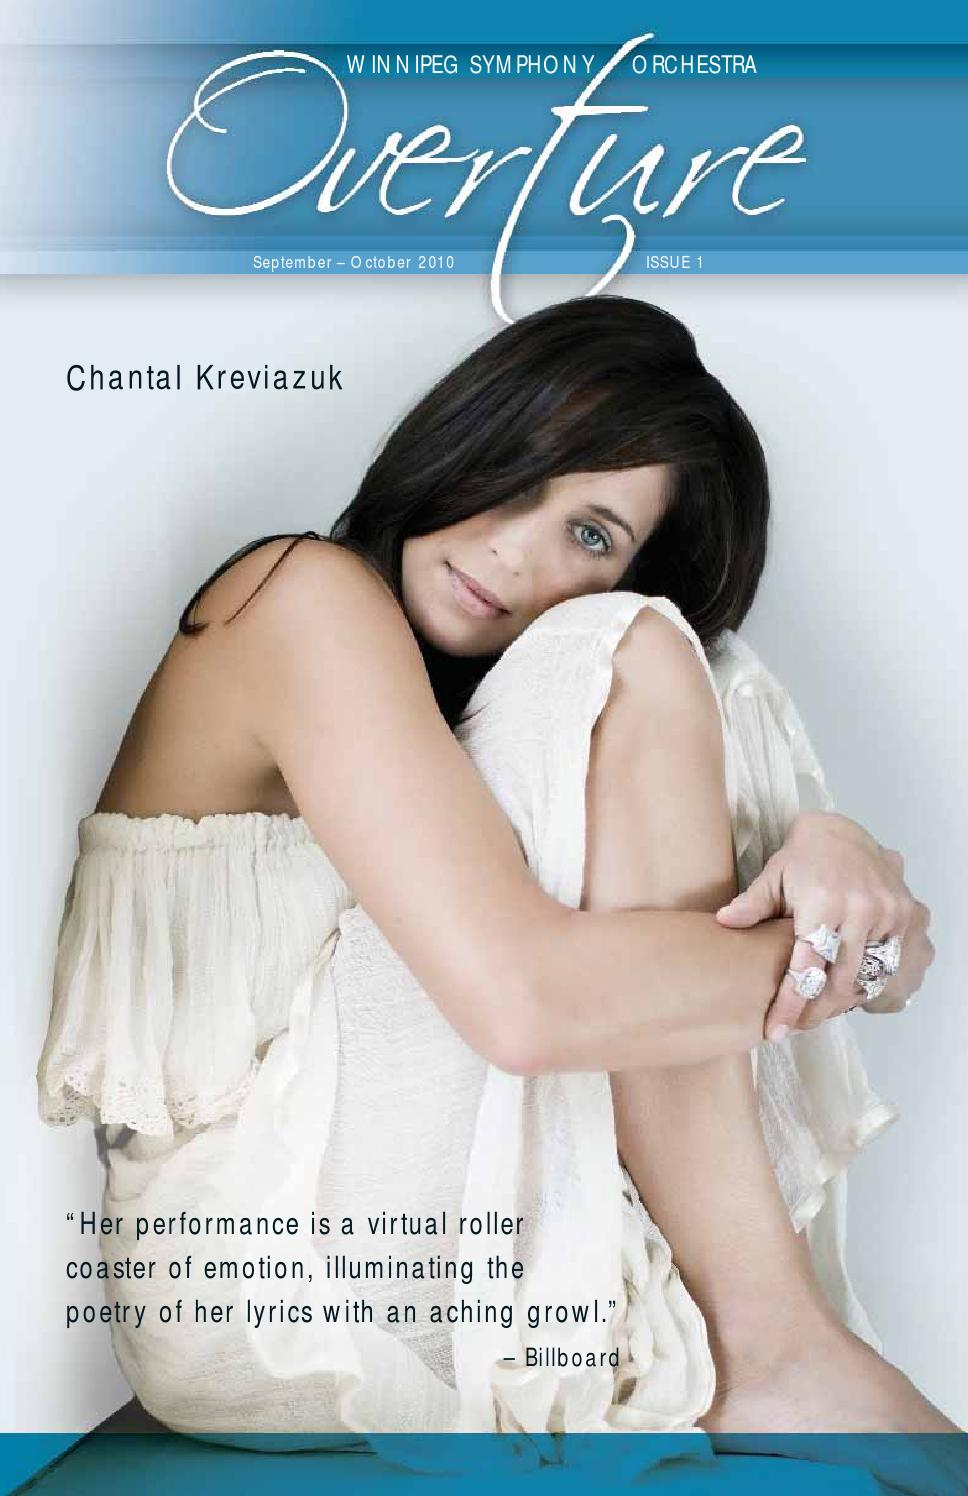 2010 2011 Overture 1 By Winnipeg Symphony Orchestra Issuu Diamond Plain Fresh Milk 949 Ml